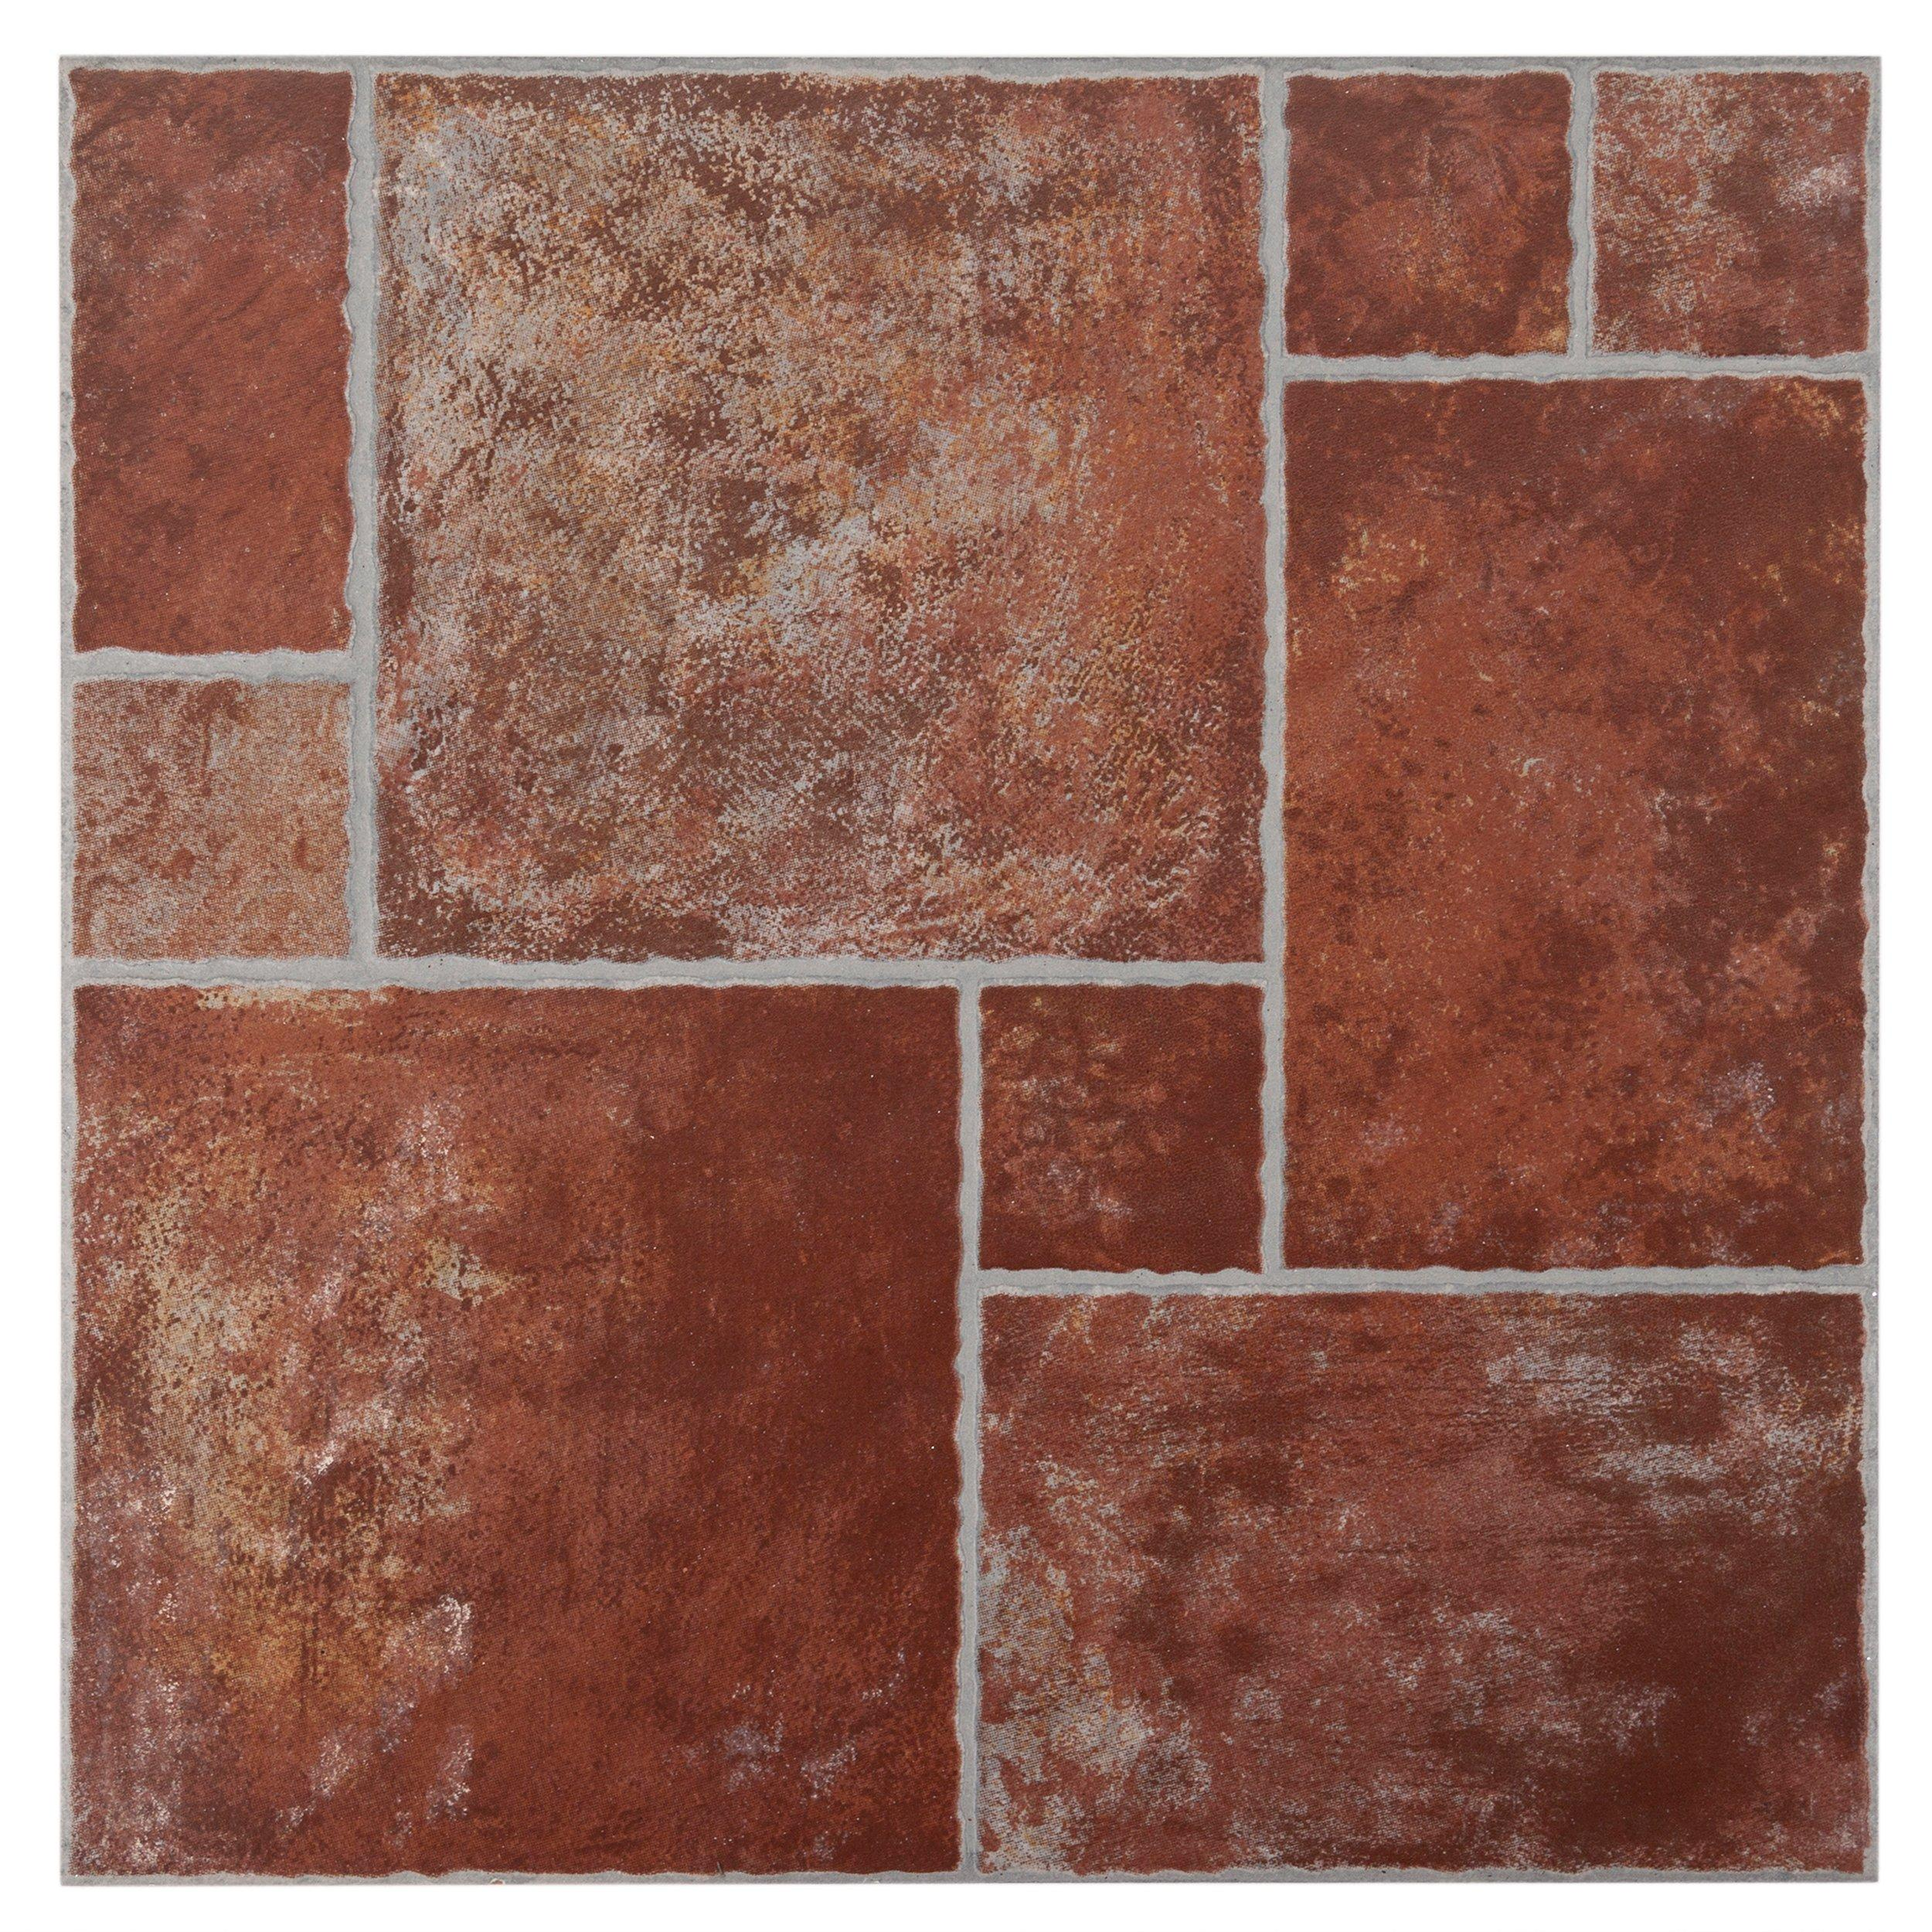 Track terracotta ceramic tile 13 x 13 911104037 floor and decor dailygadgetfo Images